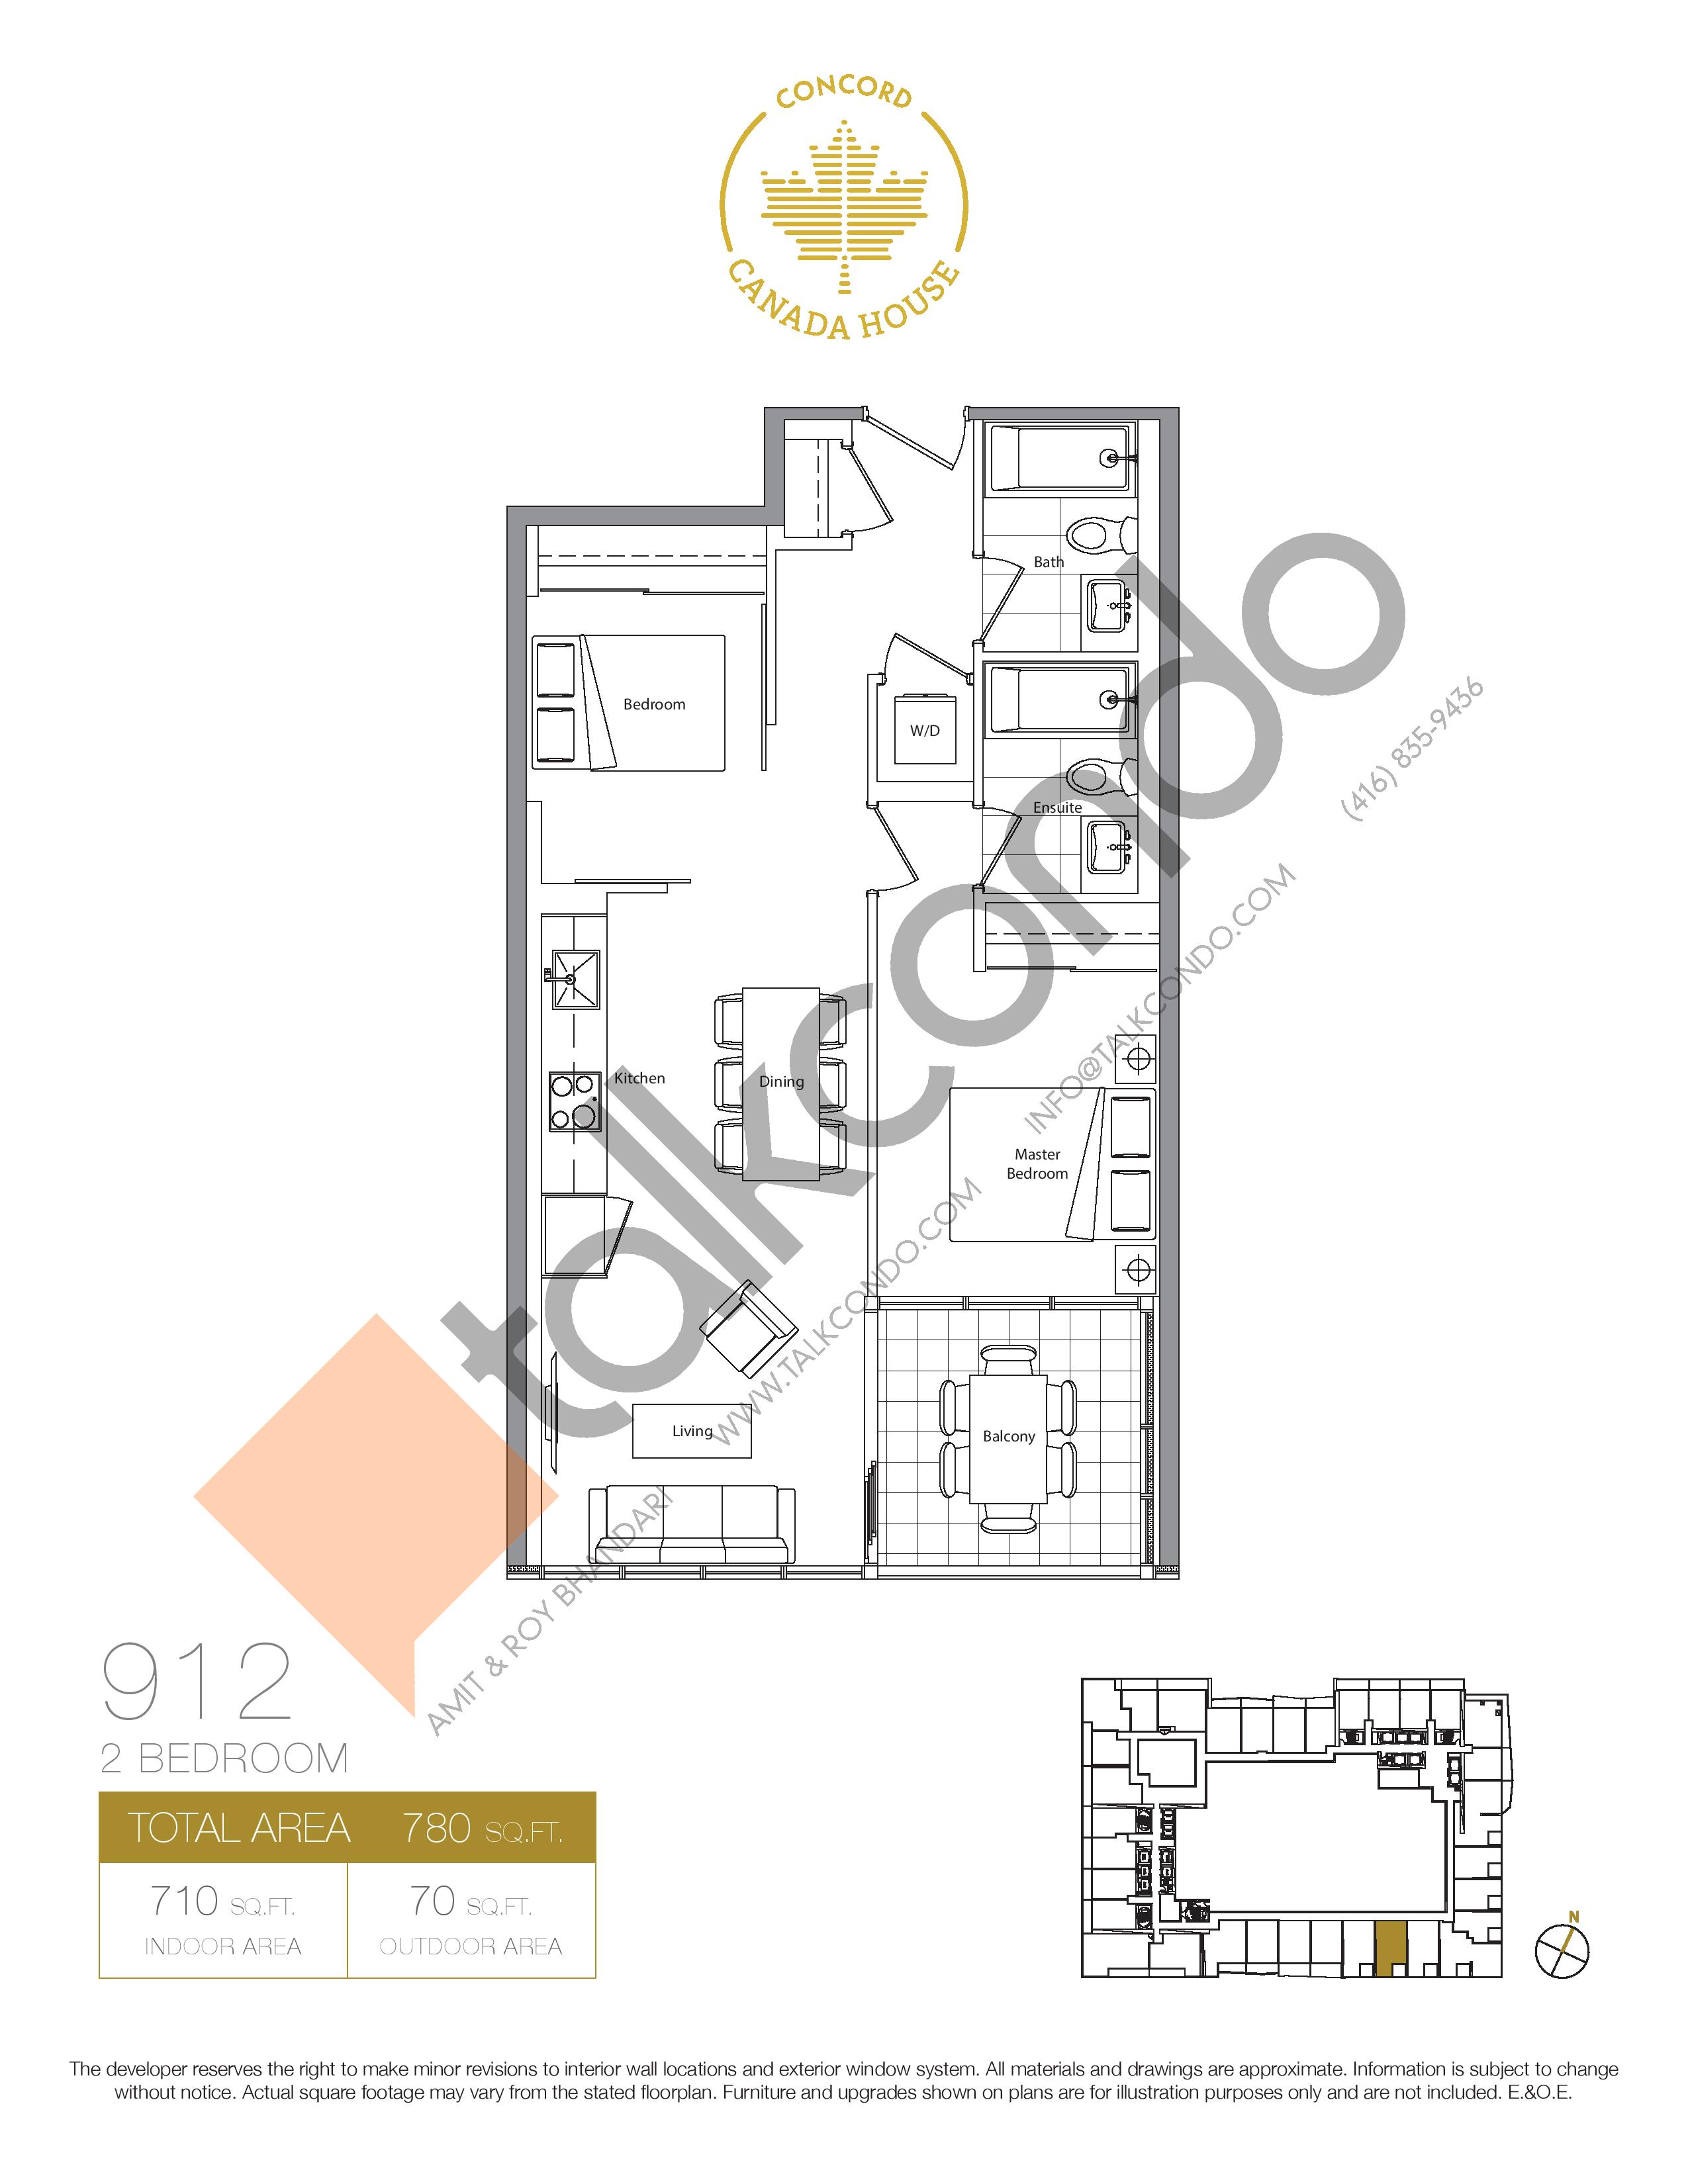 912 (Podium) Floor Plan at Concord Canada House Condos - 710 sq.ft